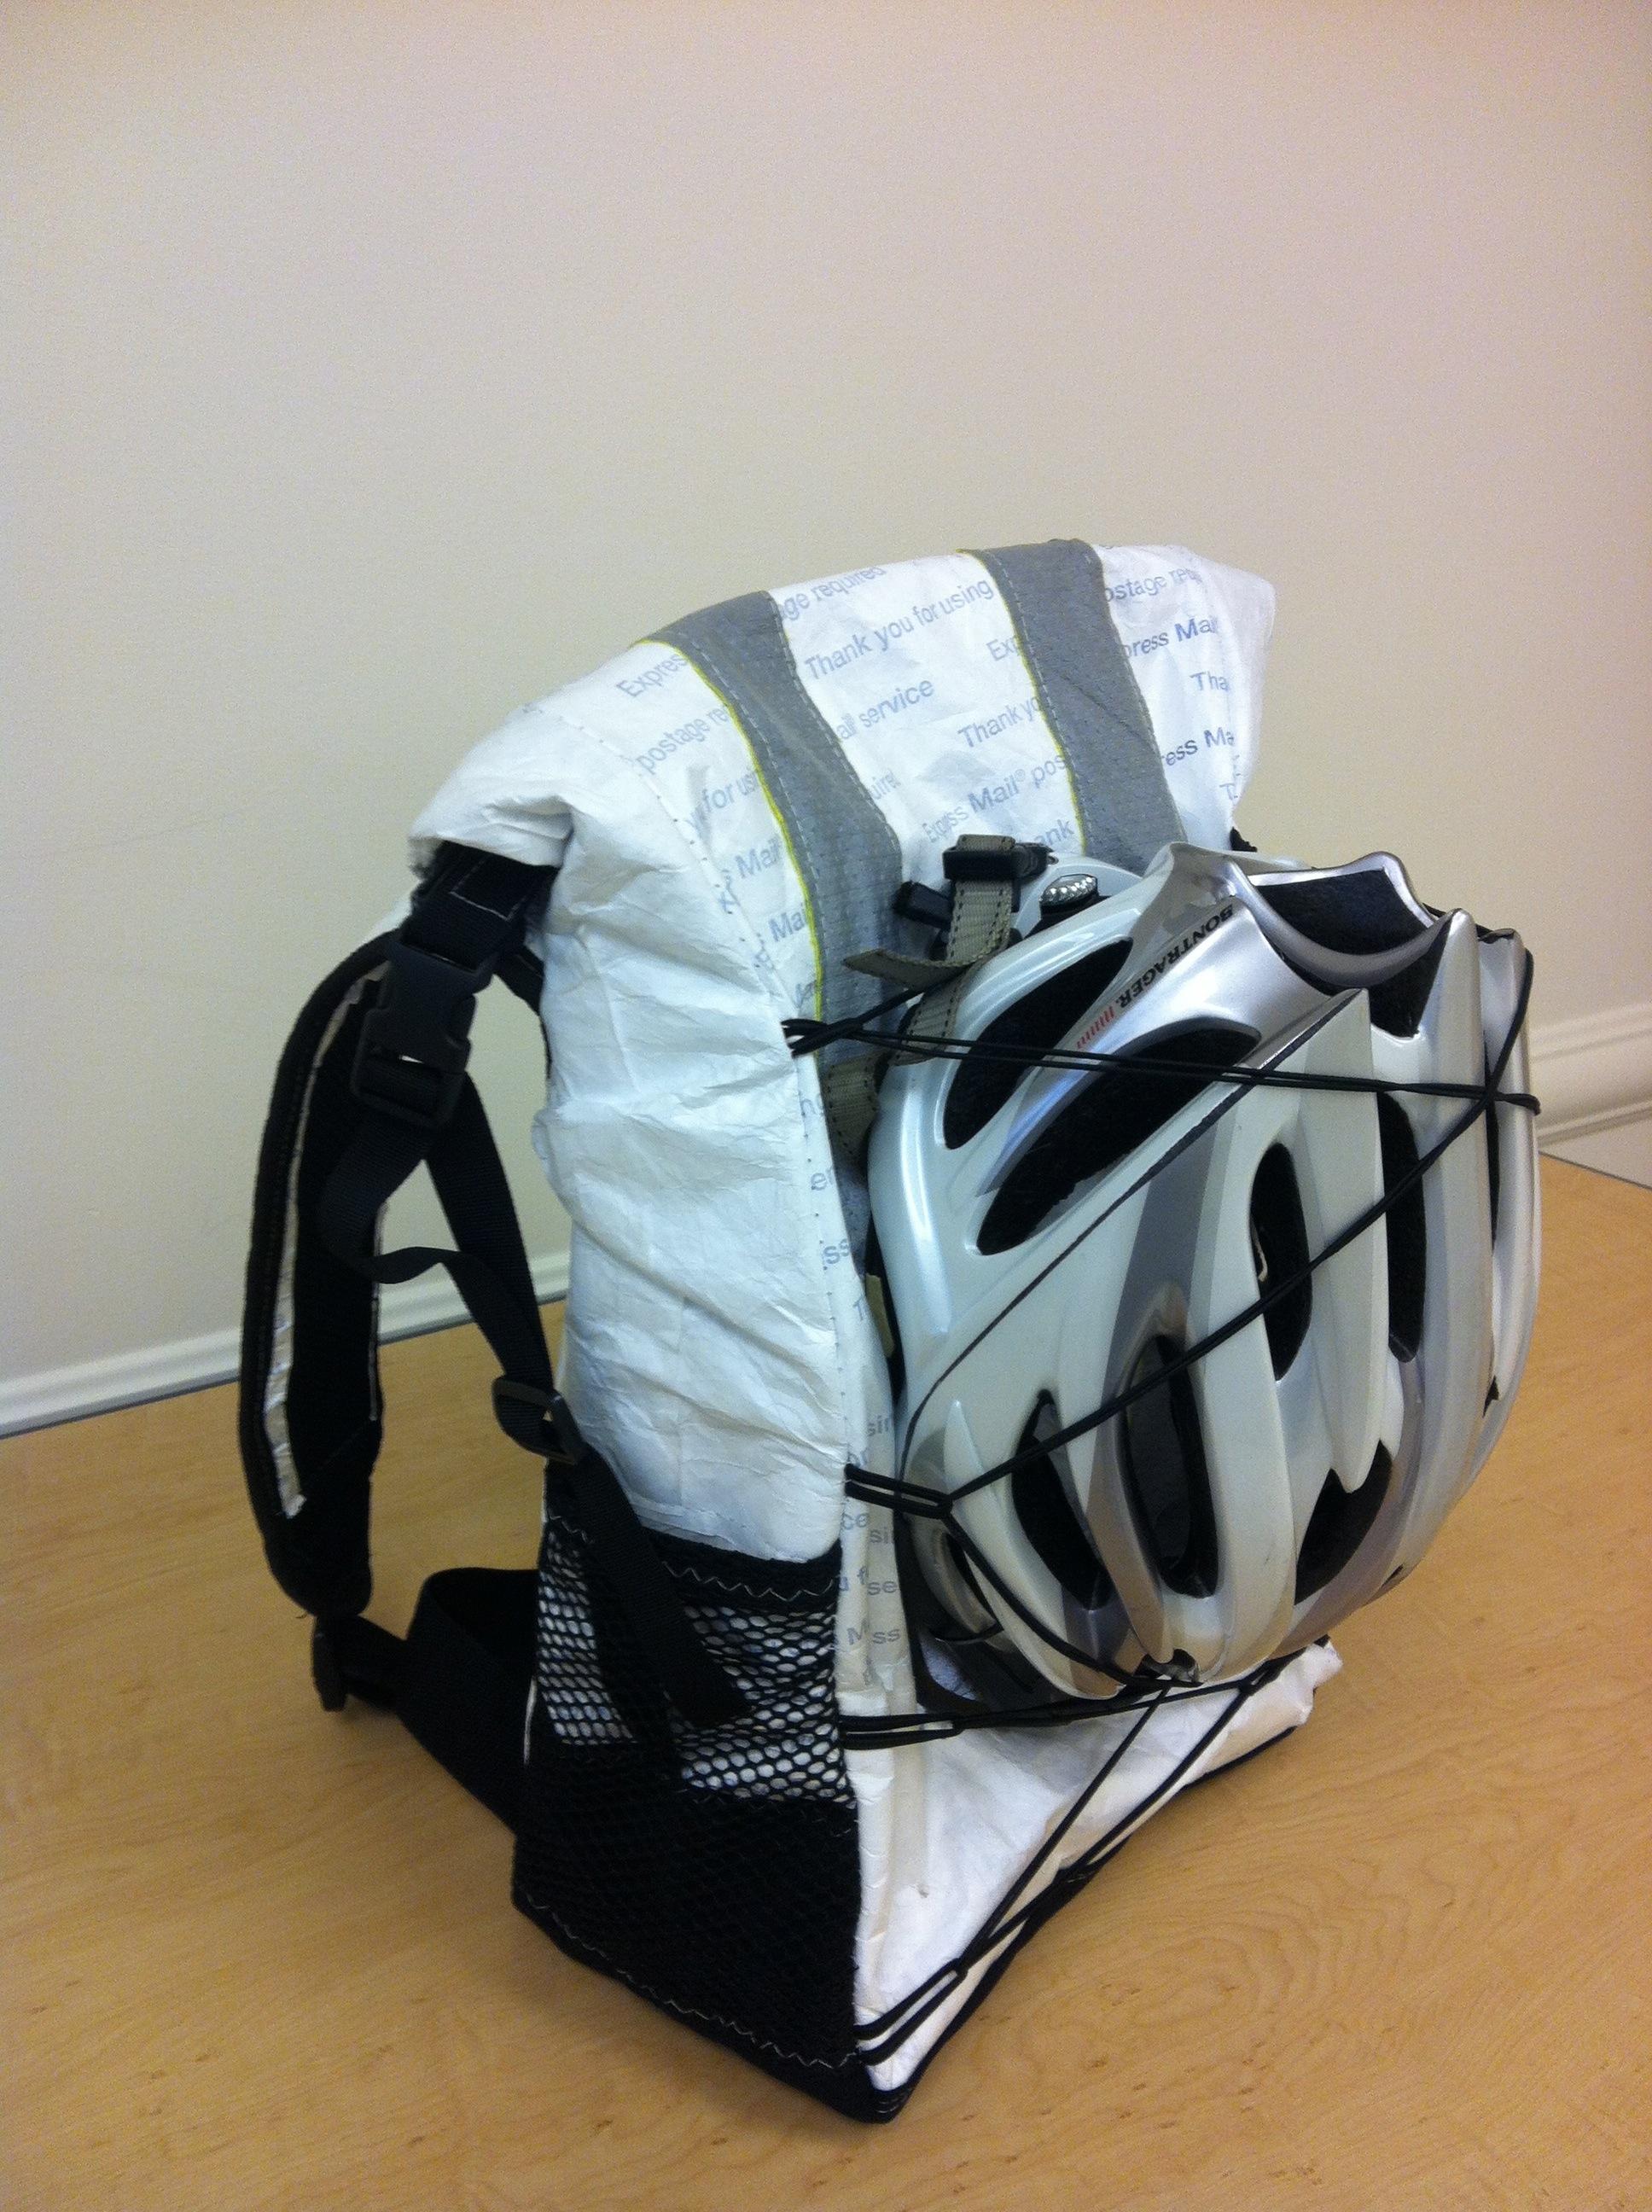 Tyvek Roll top backpack made from USPS Tyvek Envelopes.